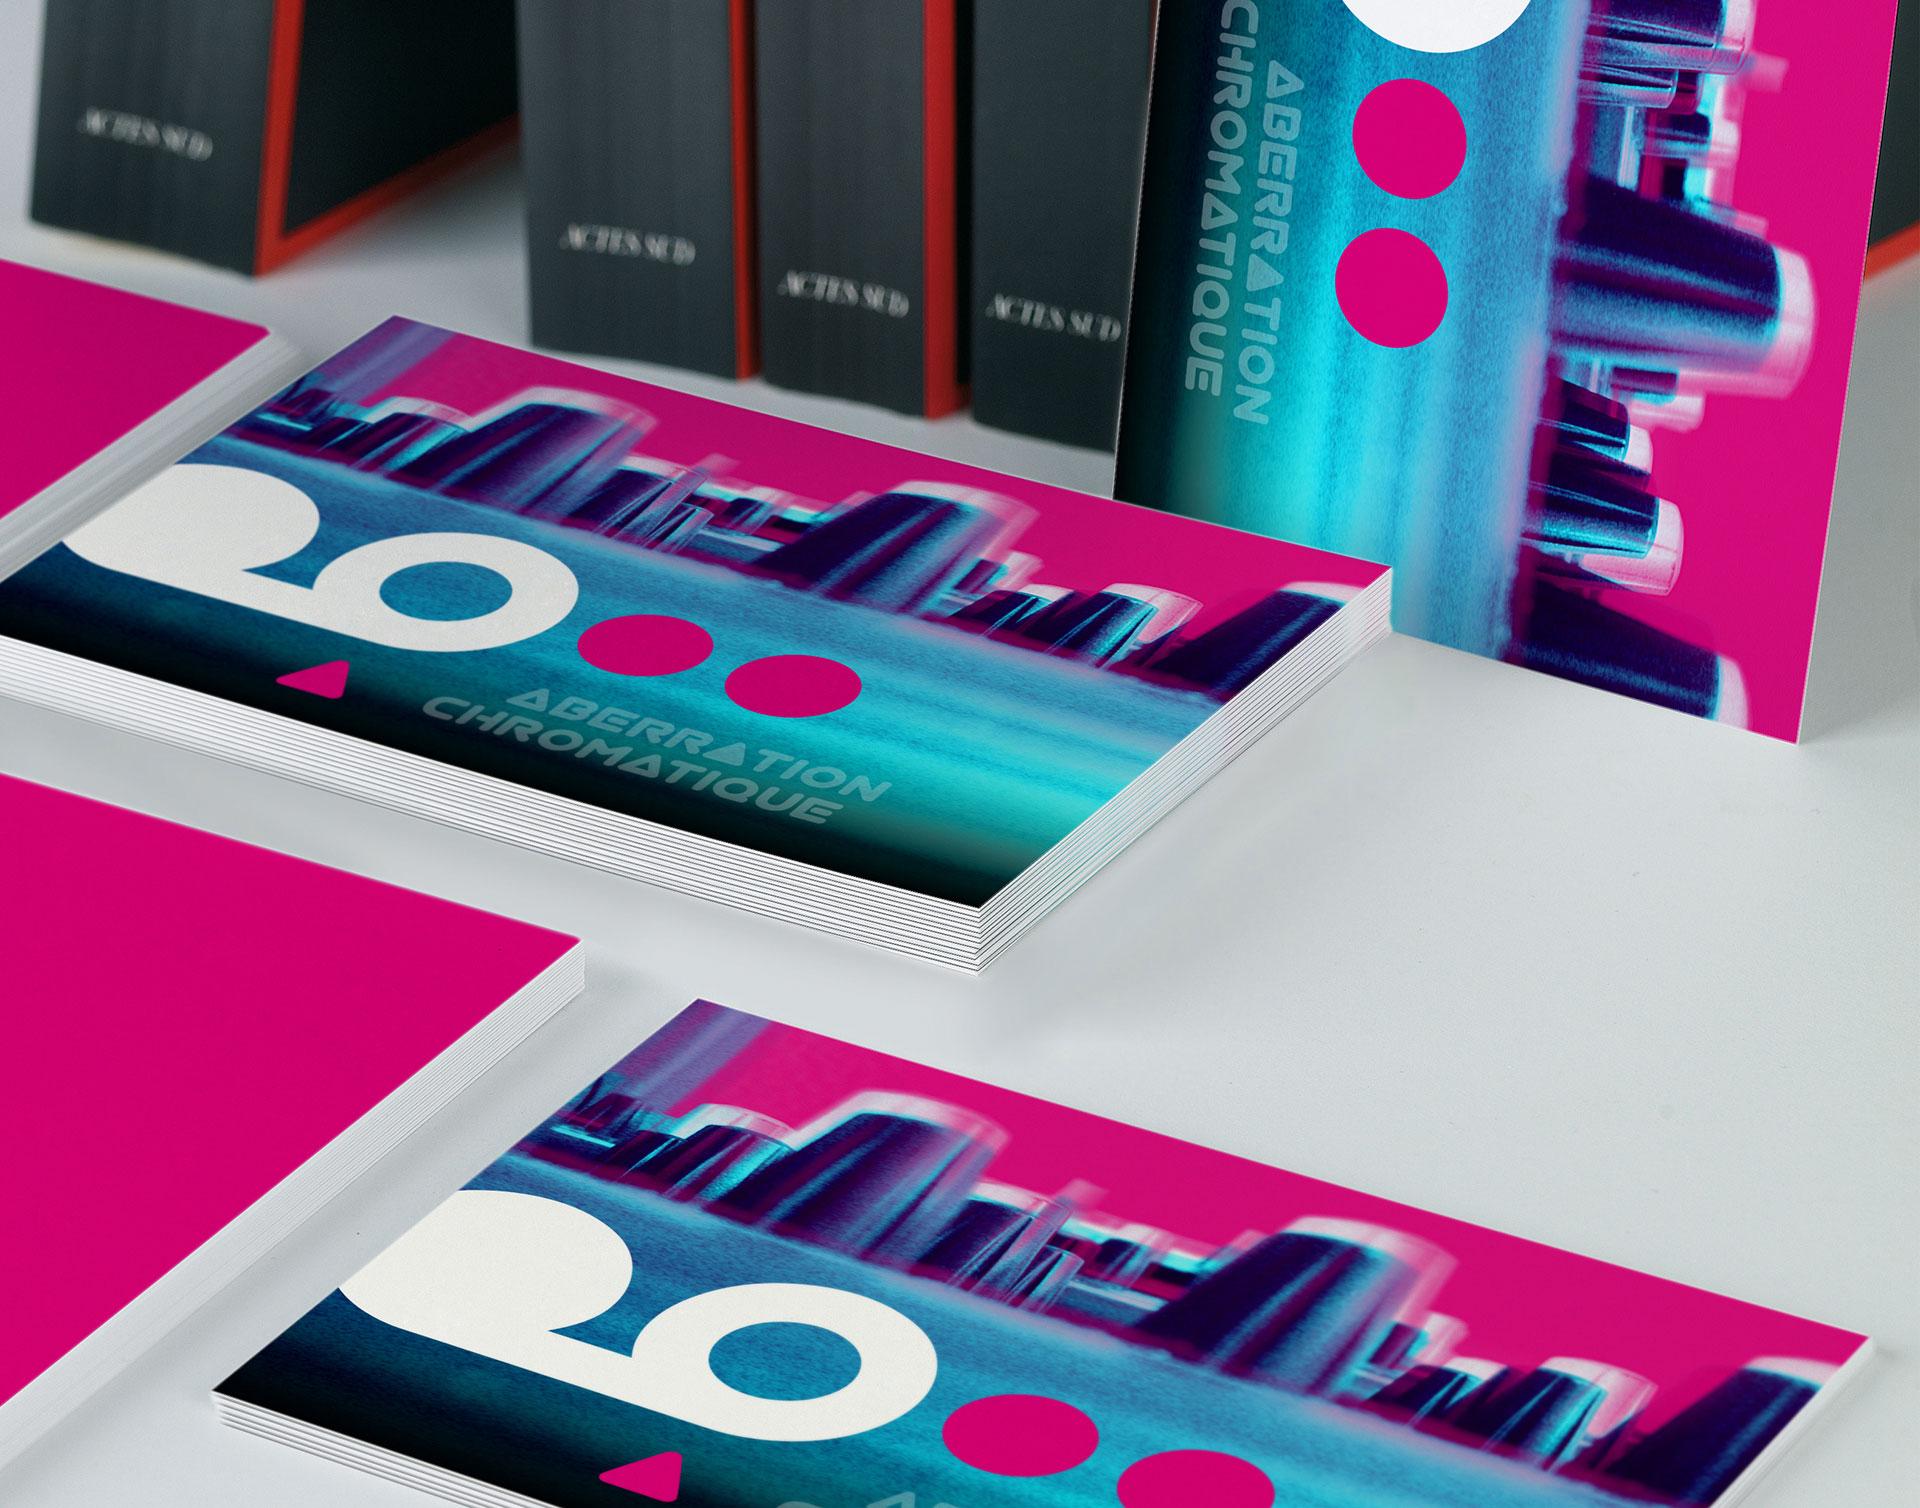 Flyer2 Aberration Chromatique-Cmondada Design